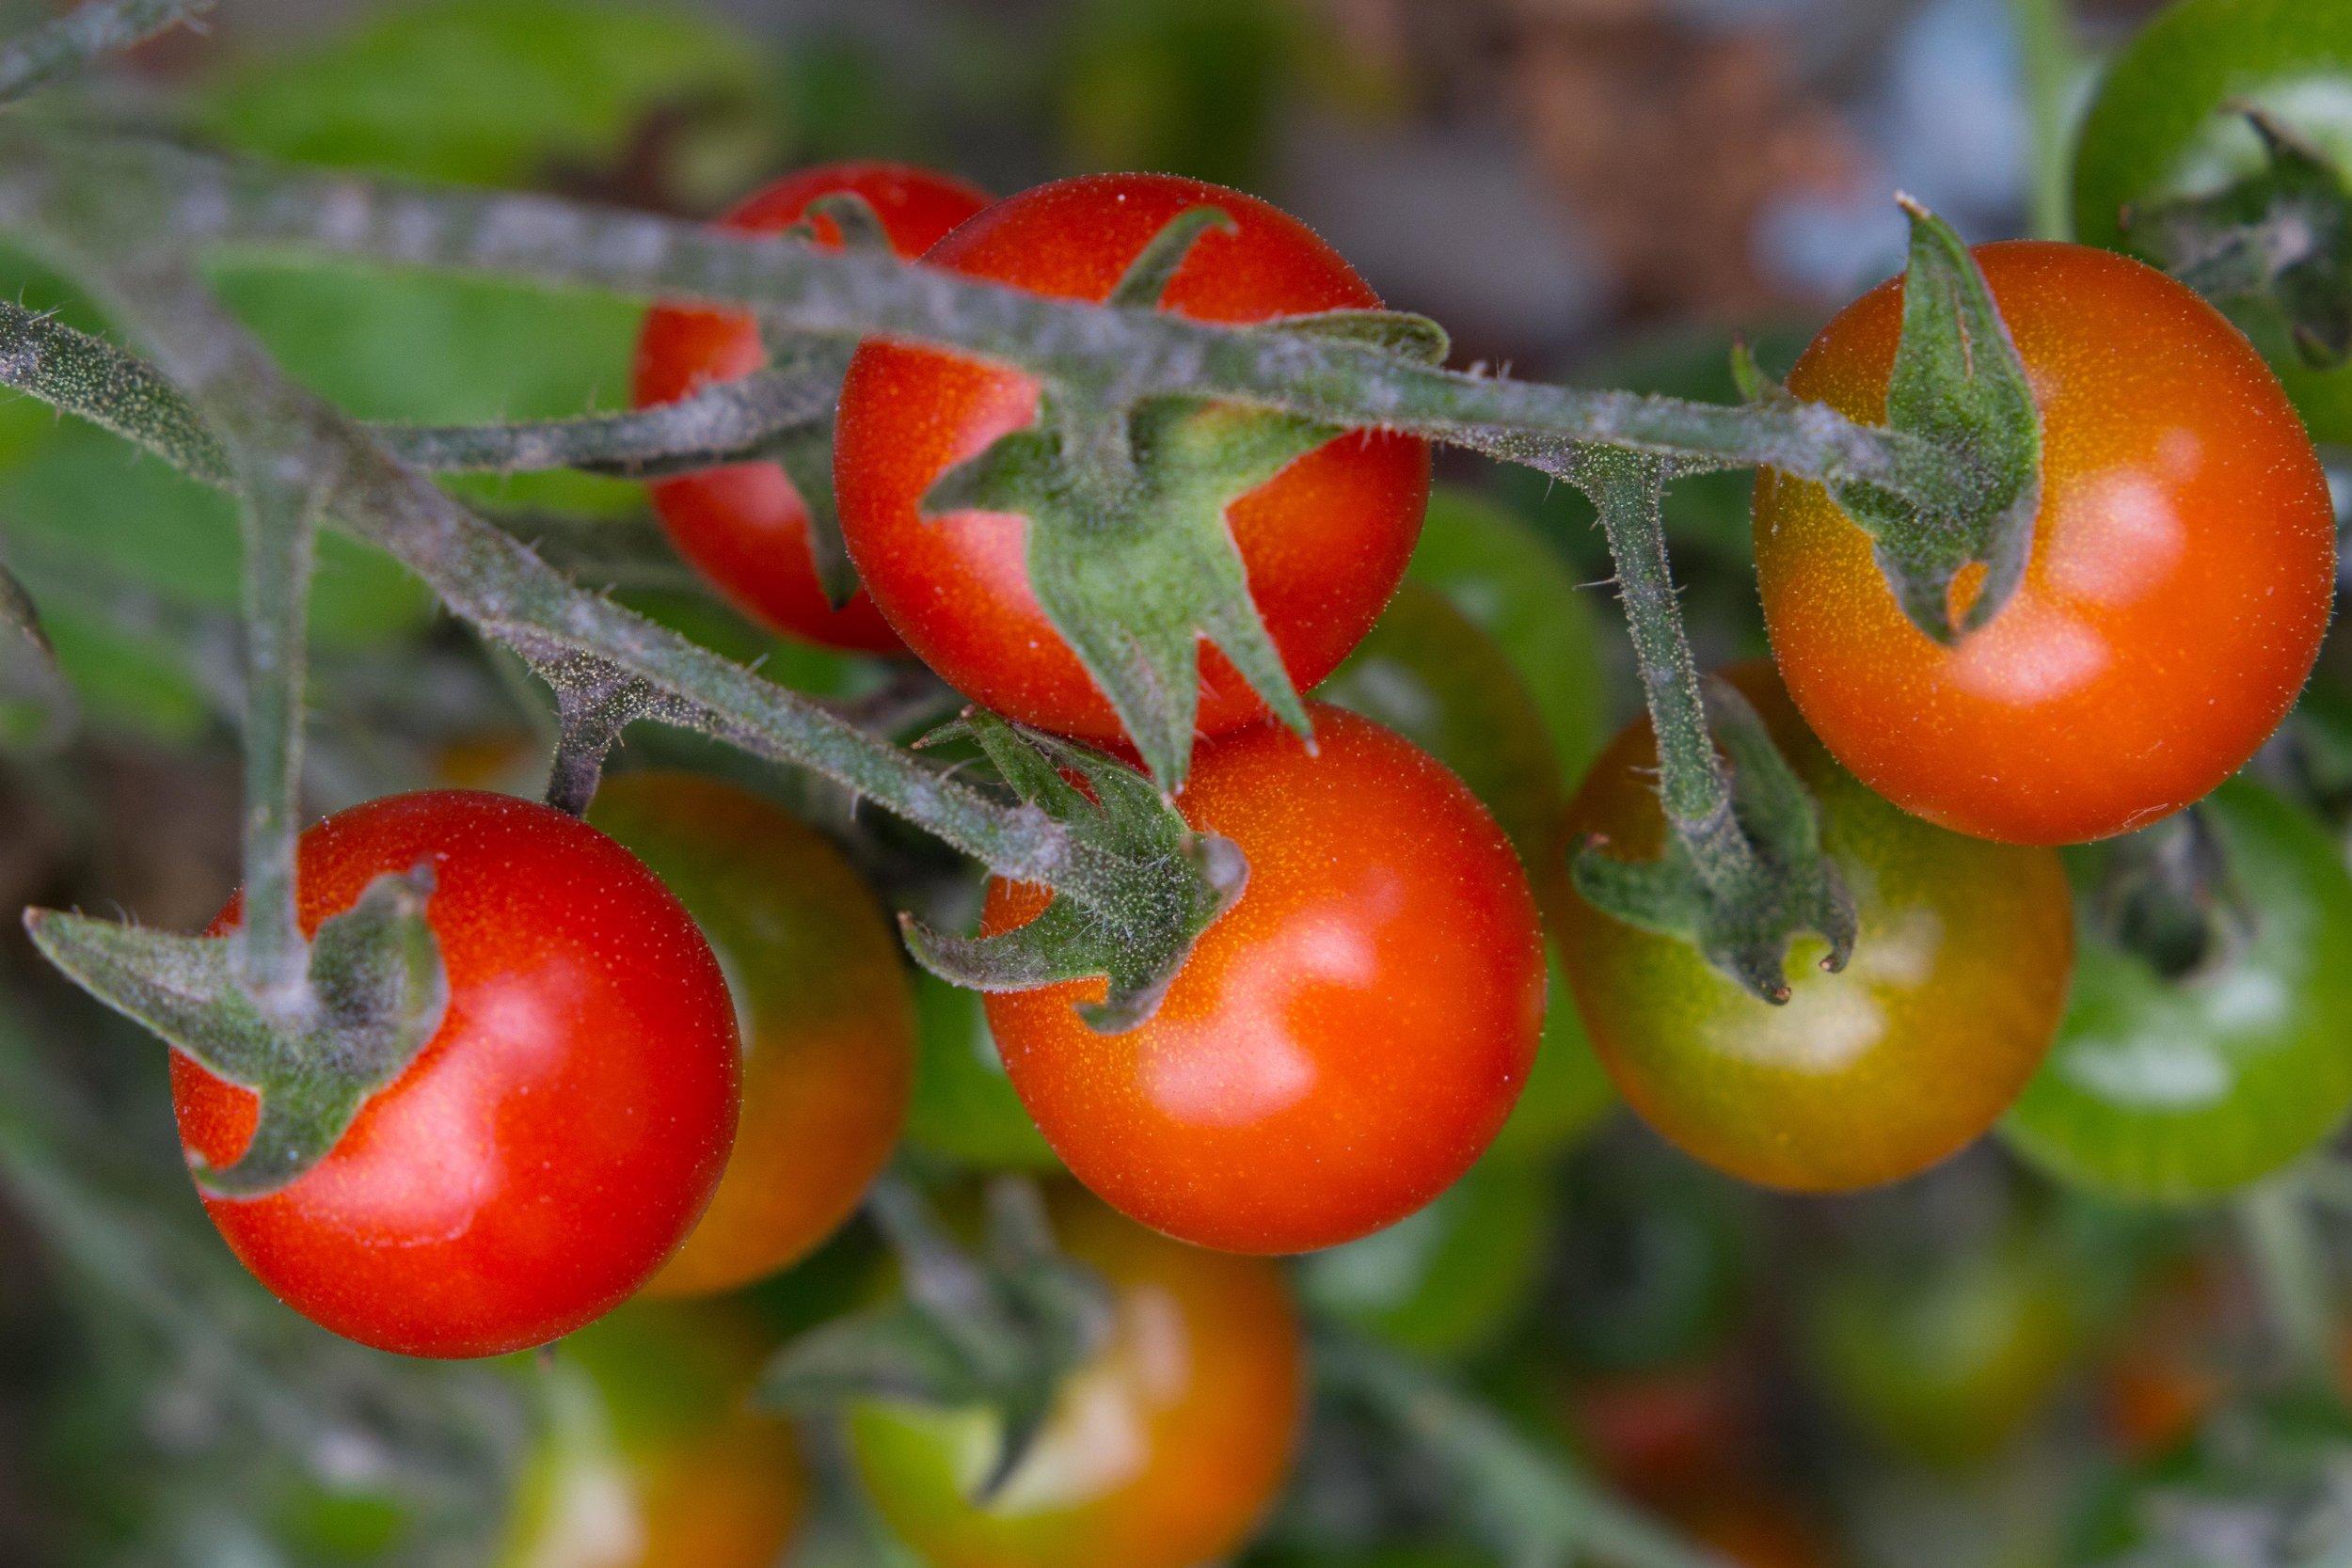 OrganicTomatoes2018-6802.jpg